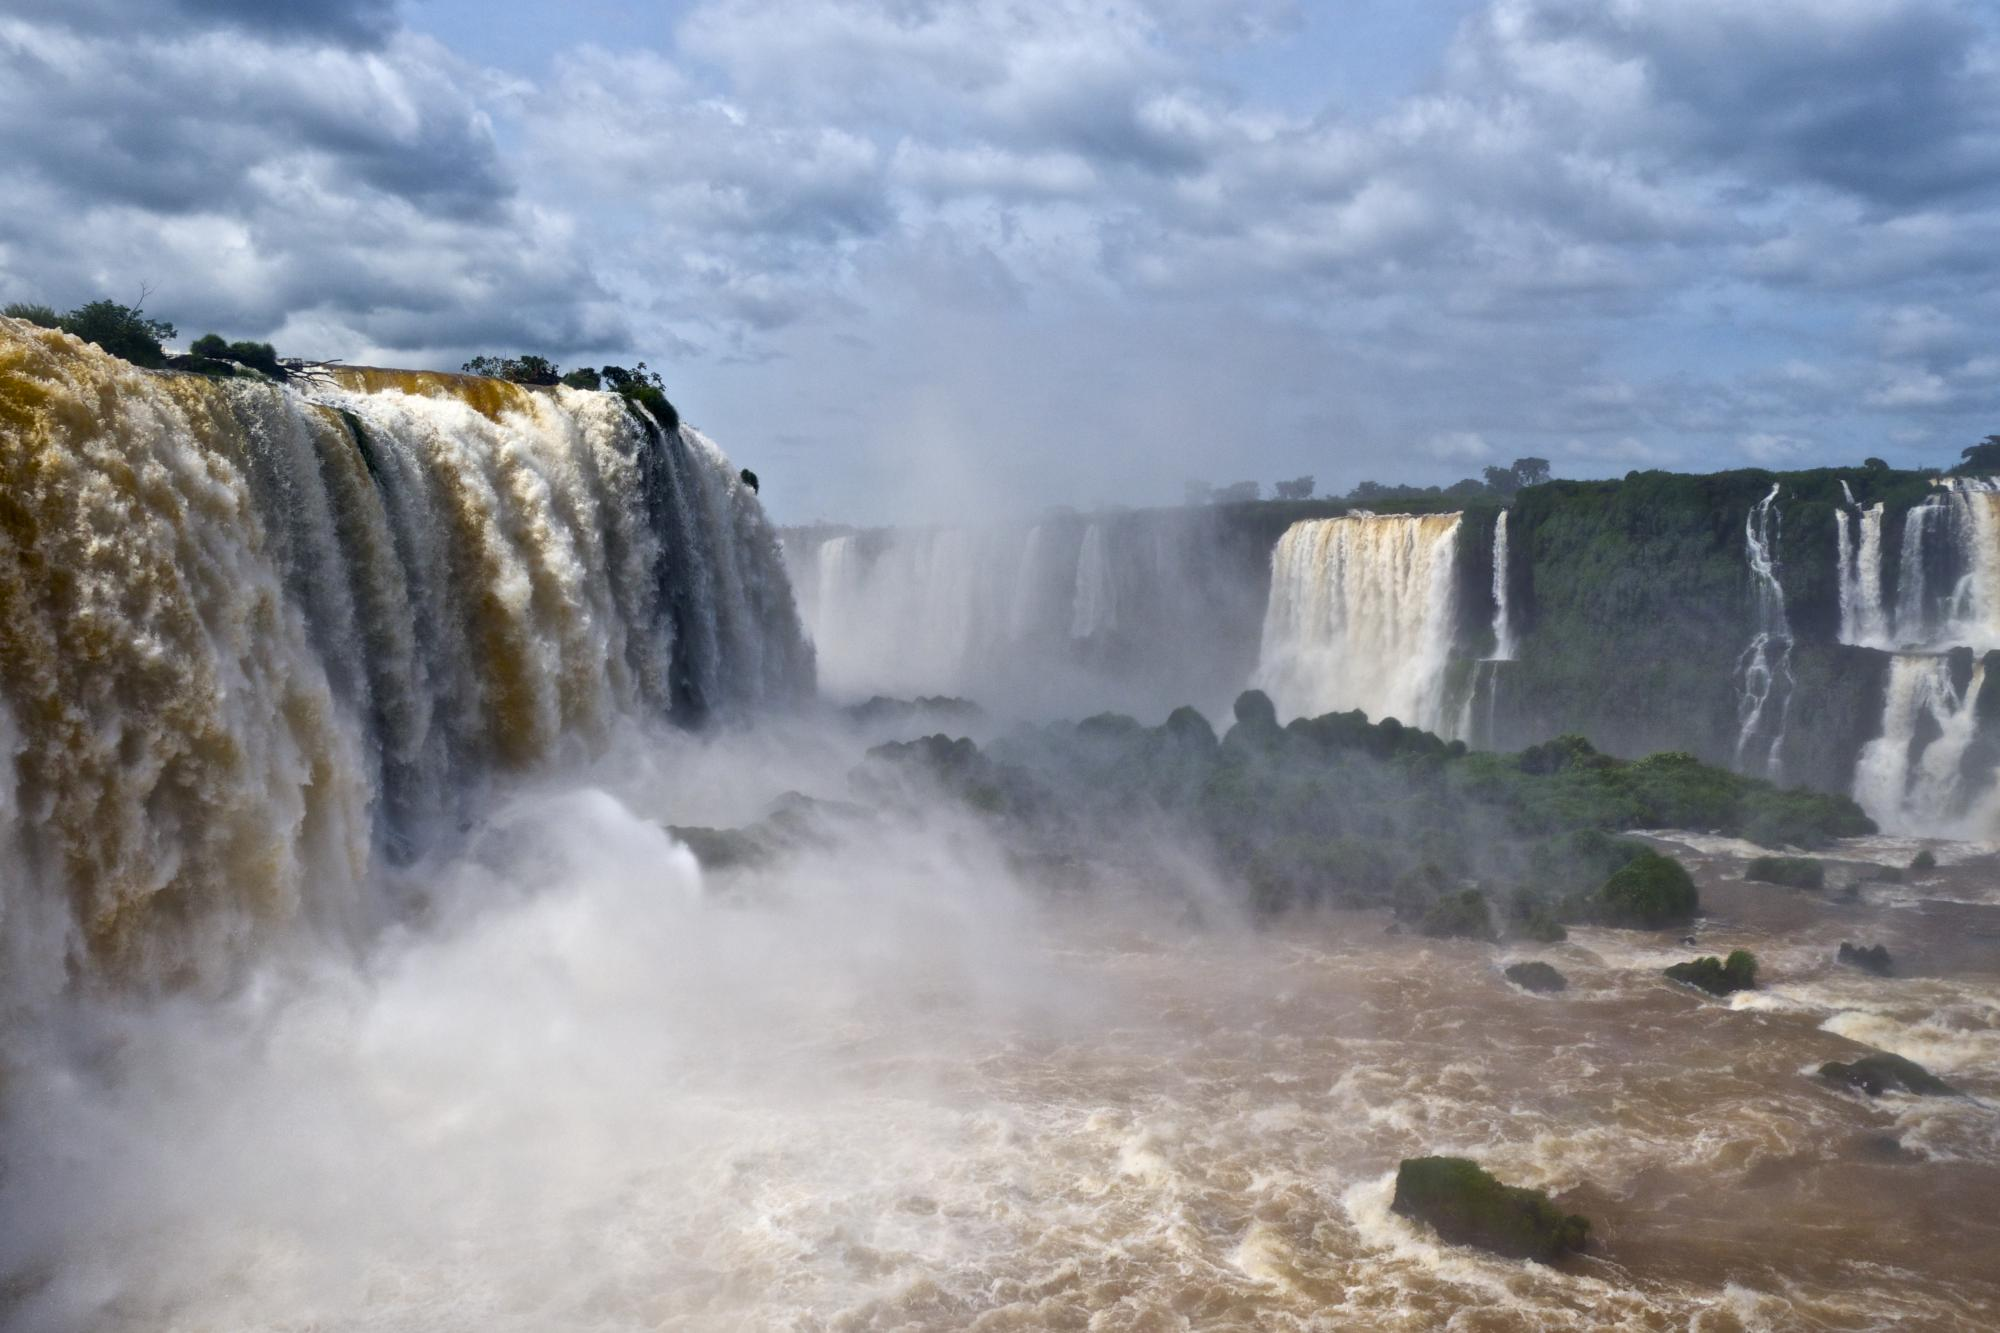 Visiting Iguazu Falls: Brazil and Argentina